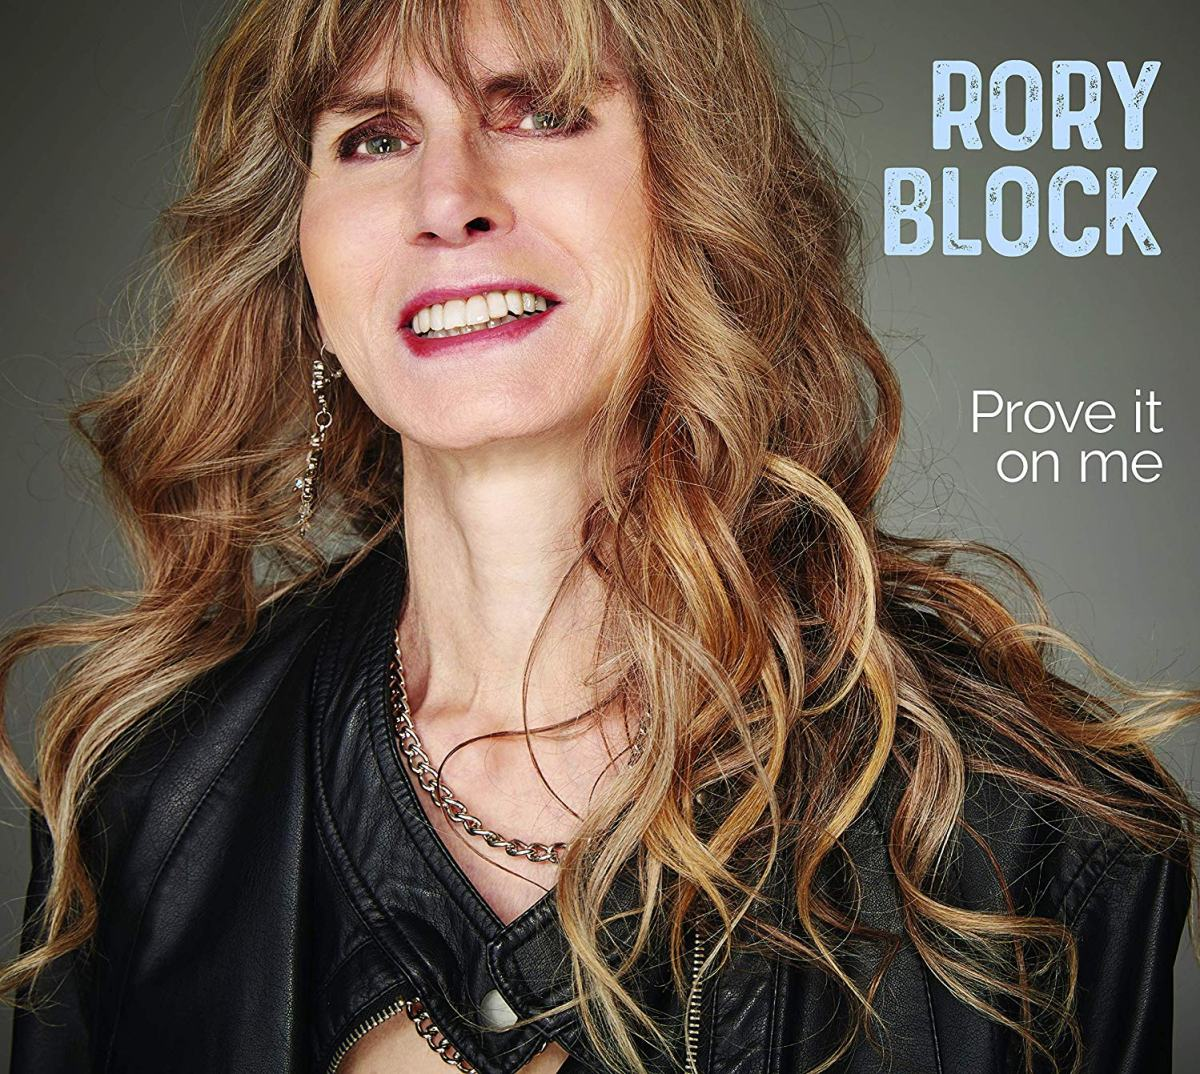 Rory Block Prove It On Me